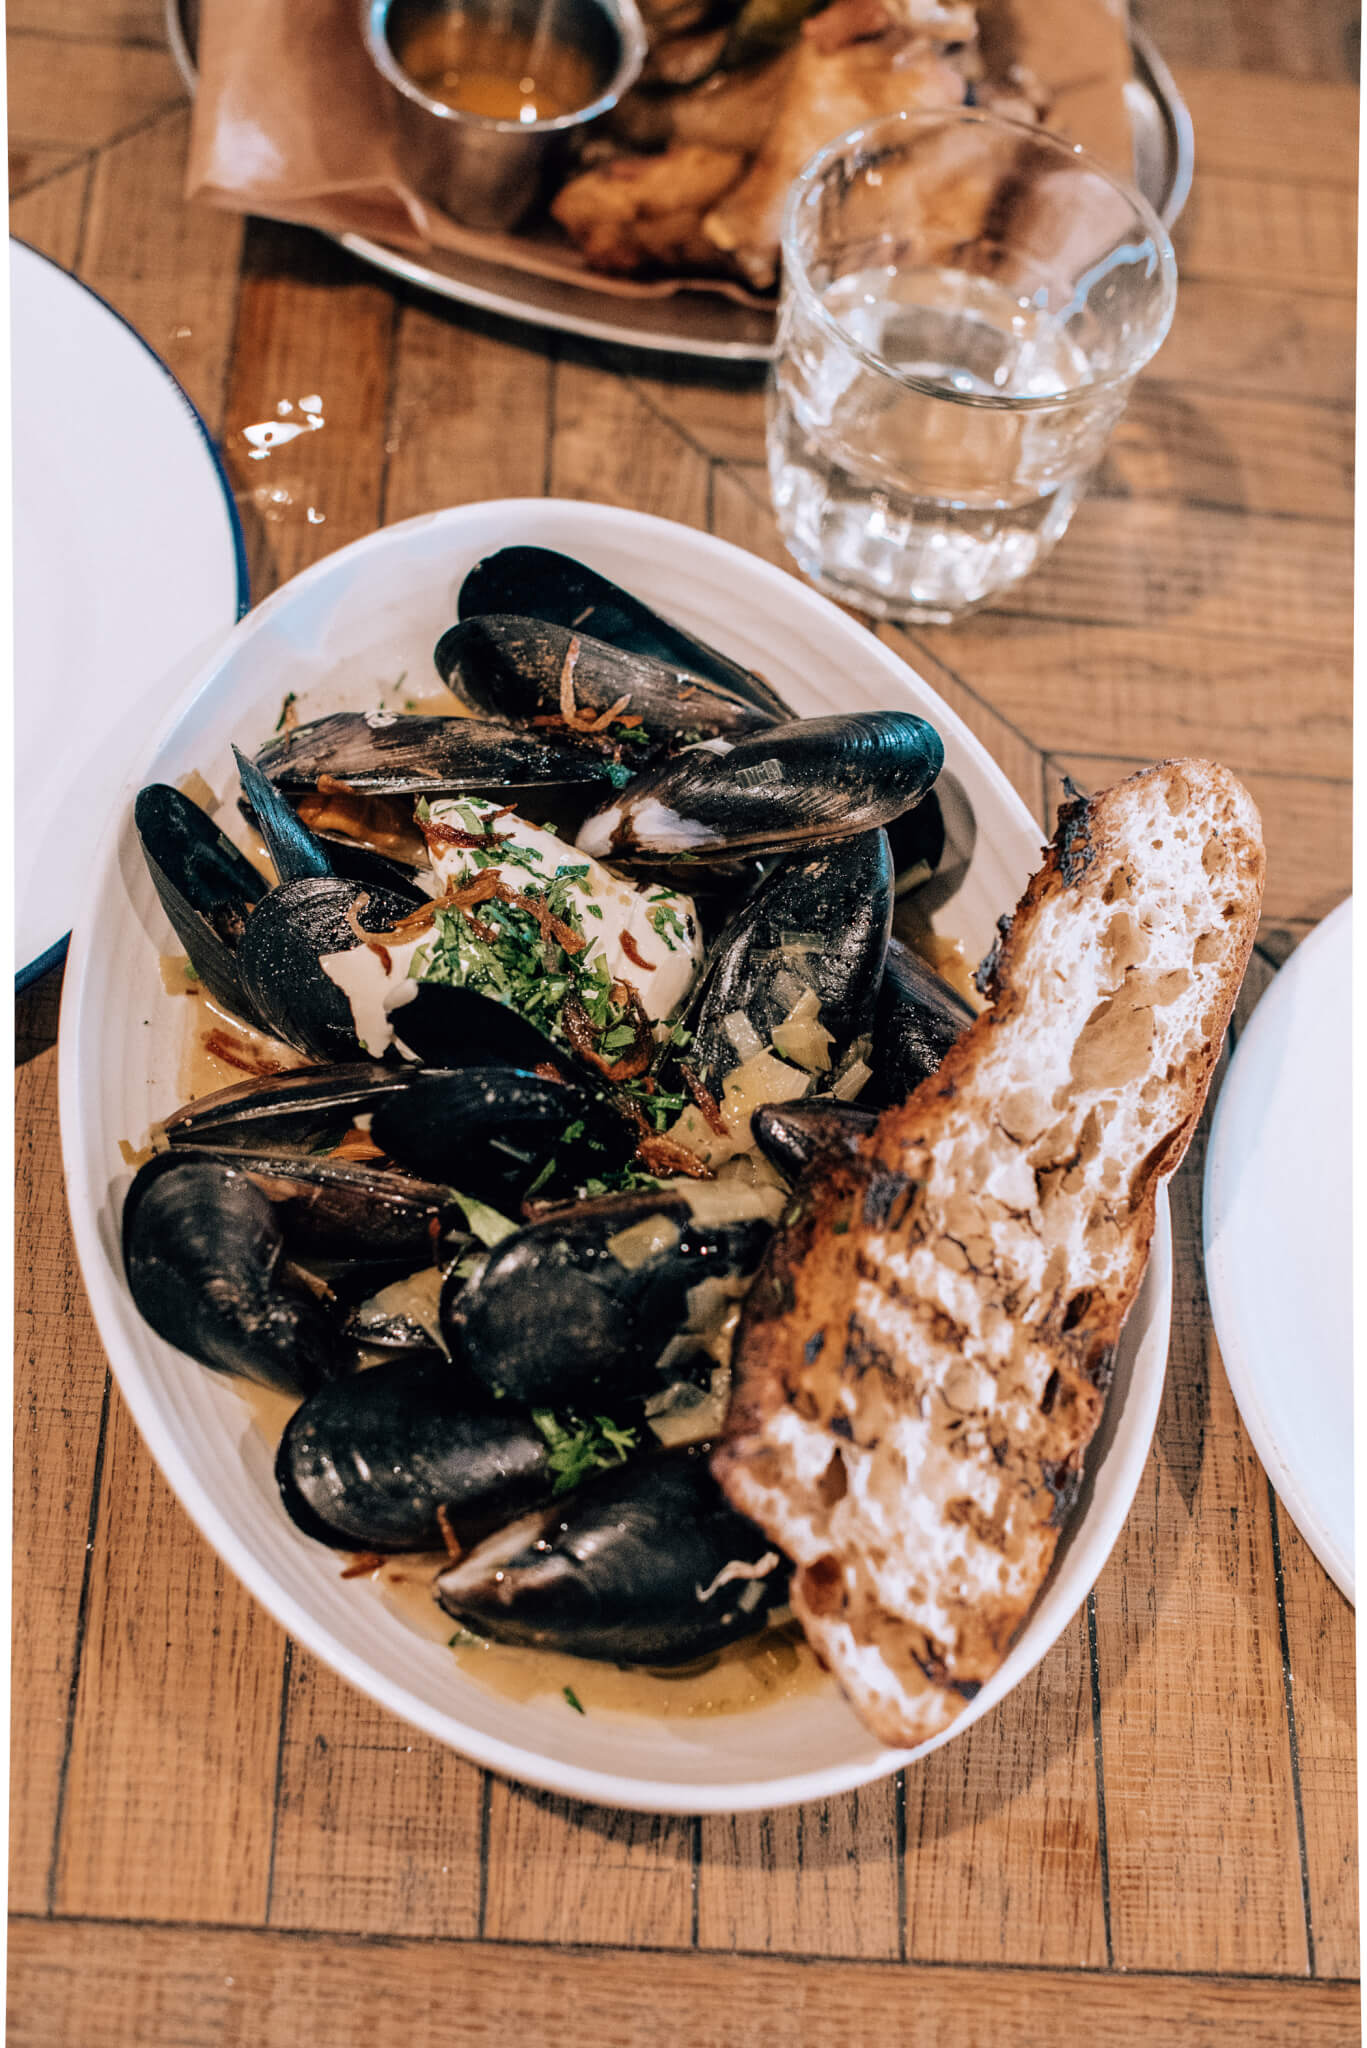 Best Restaurants in Sydney: 15 Sydney Restaurants You Shouldn't Miss featured by popular San Francisco travel blogger WTFab